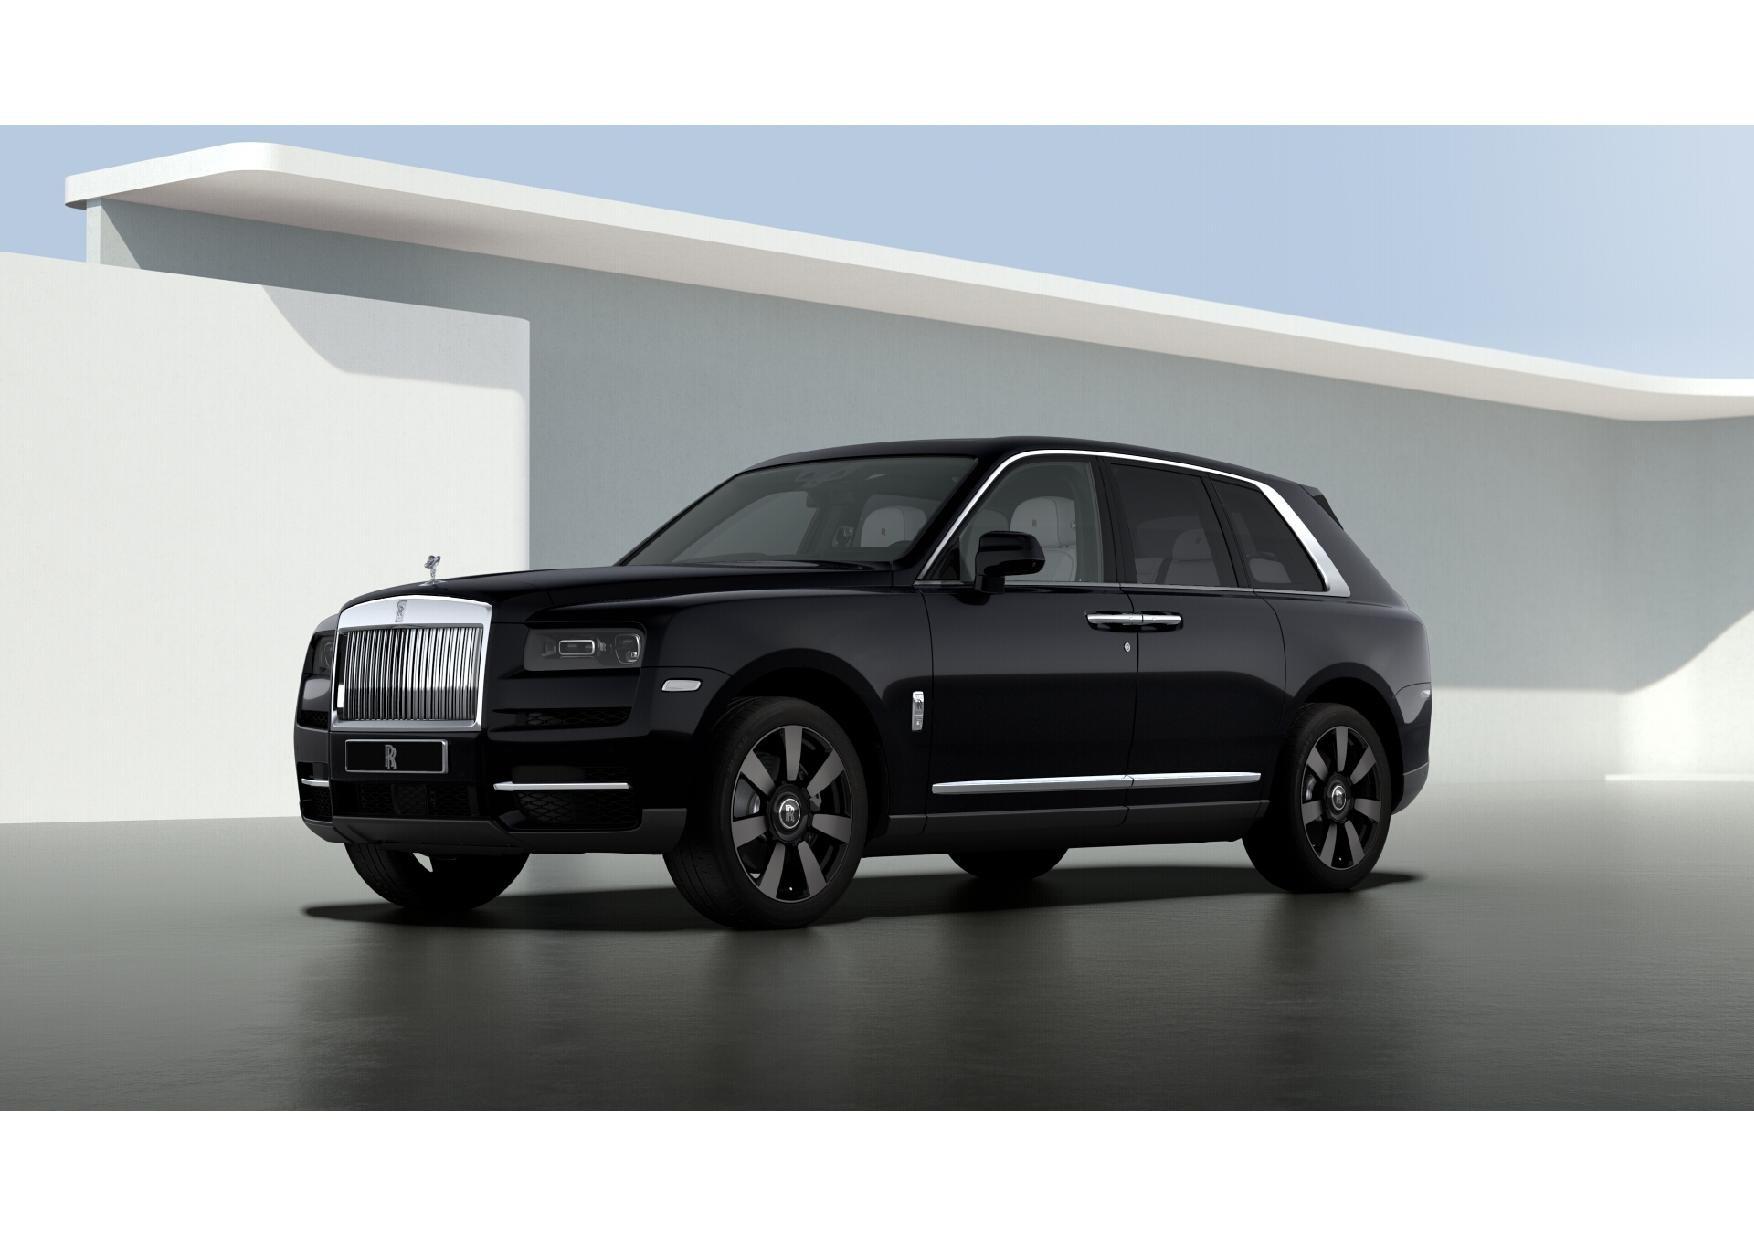 New 2021 Rolls-Royce Cullinan for sale $376,075 at Alfa Romeo of Westport in Westport CT 06880 1